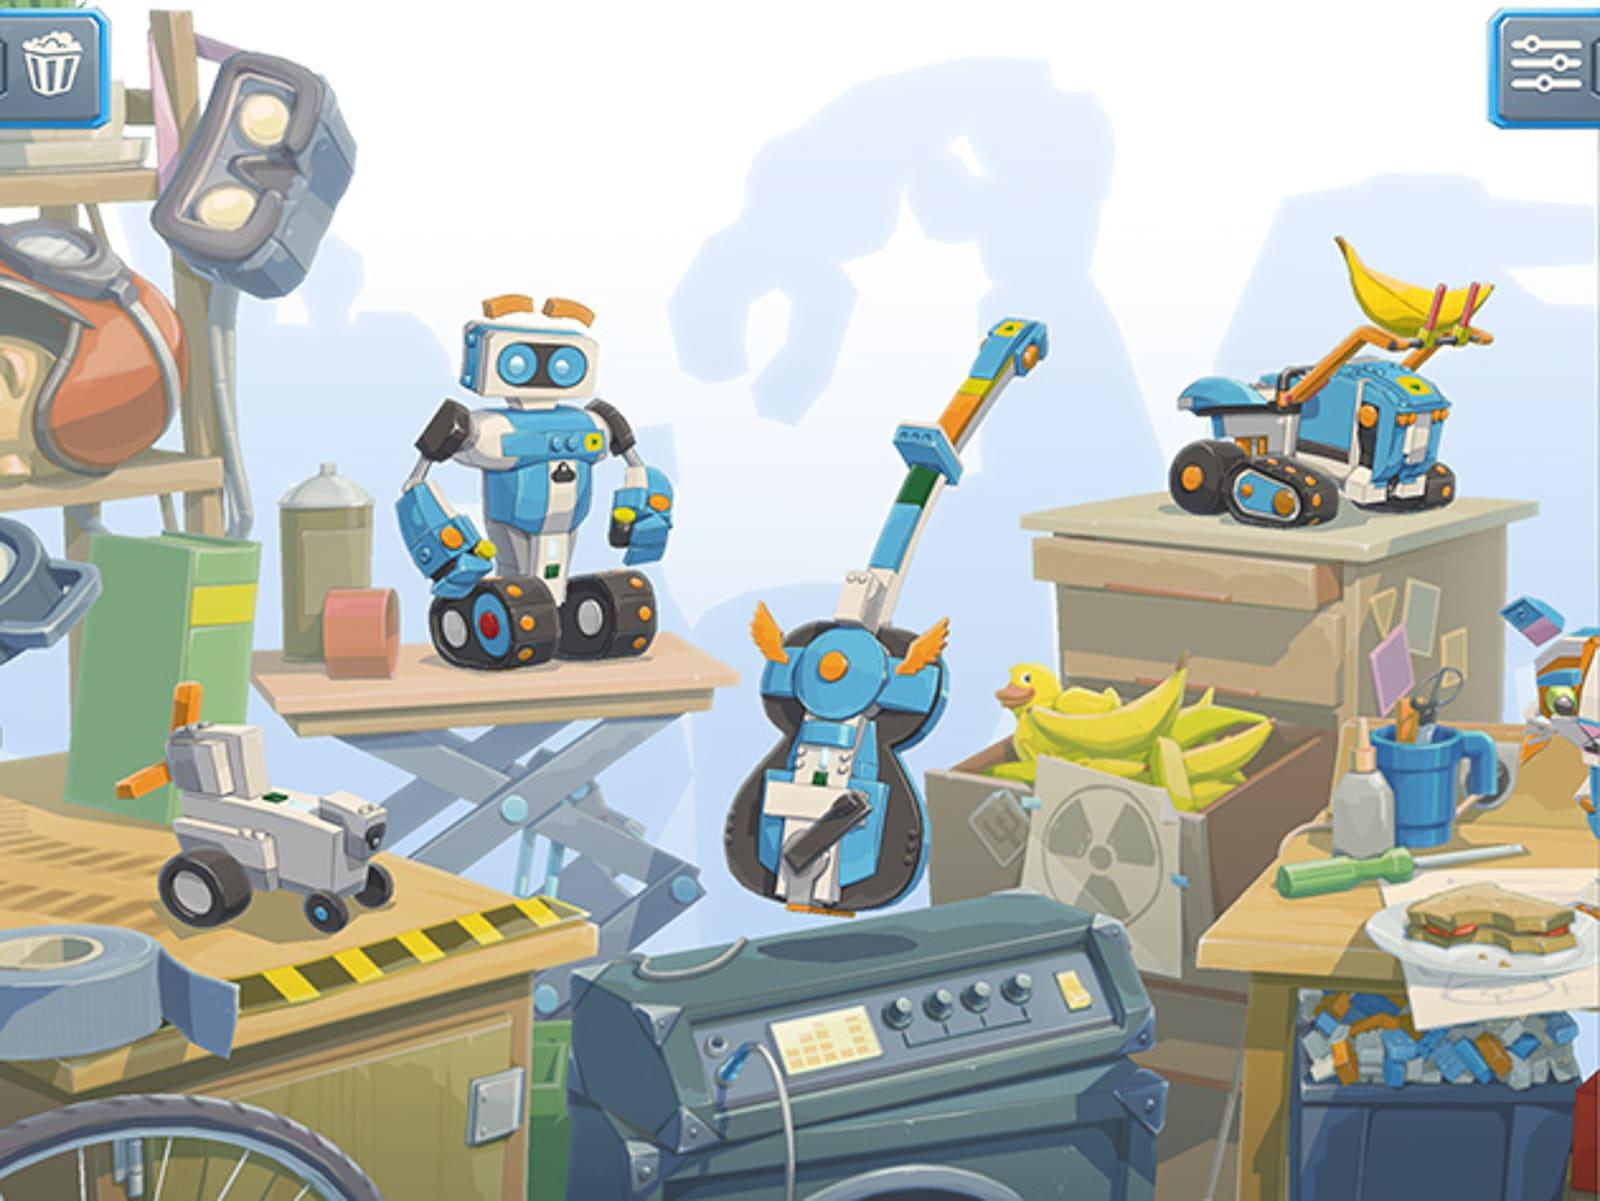 The best robotics kits for beginnersLatest Commentary Today